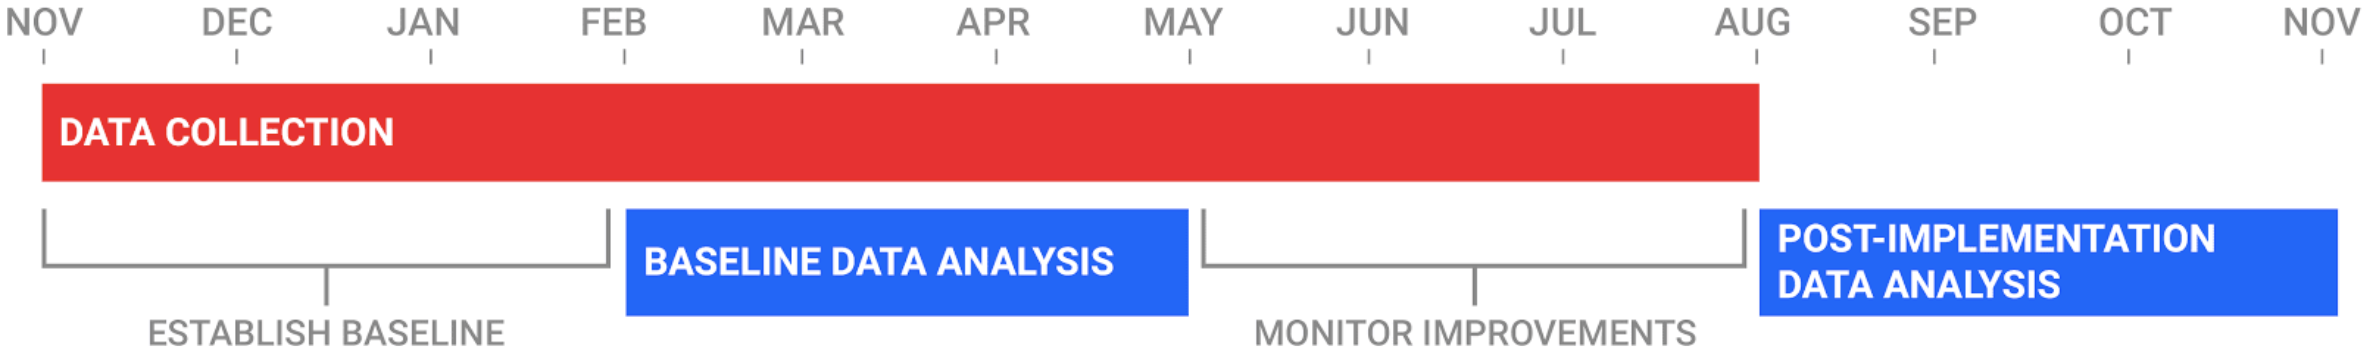 specimen-study-timeline